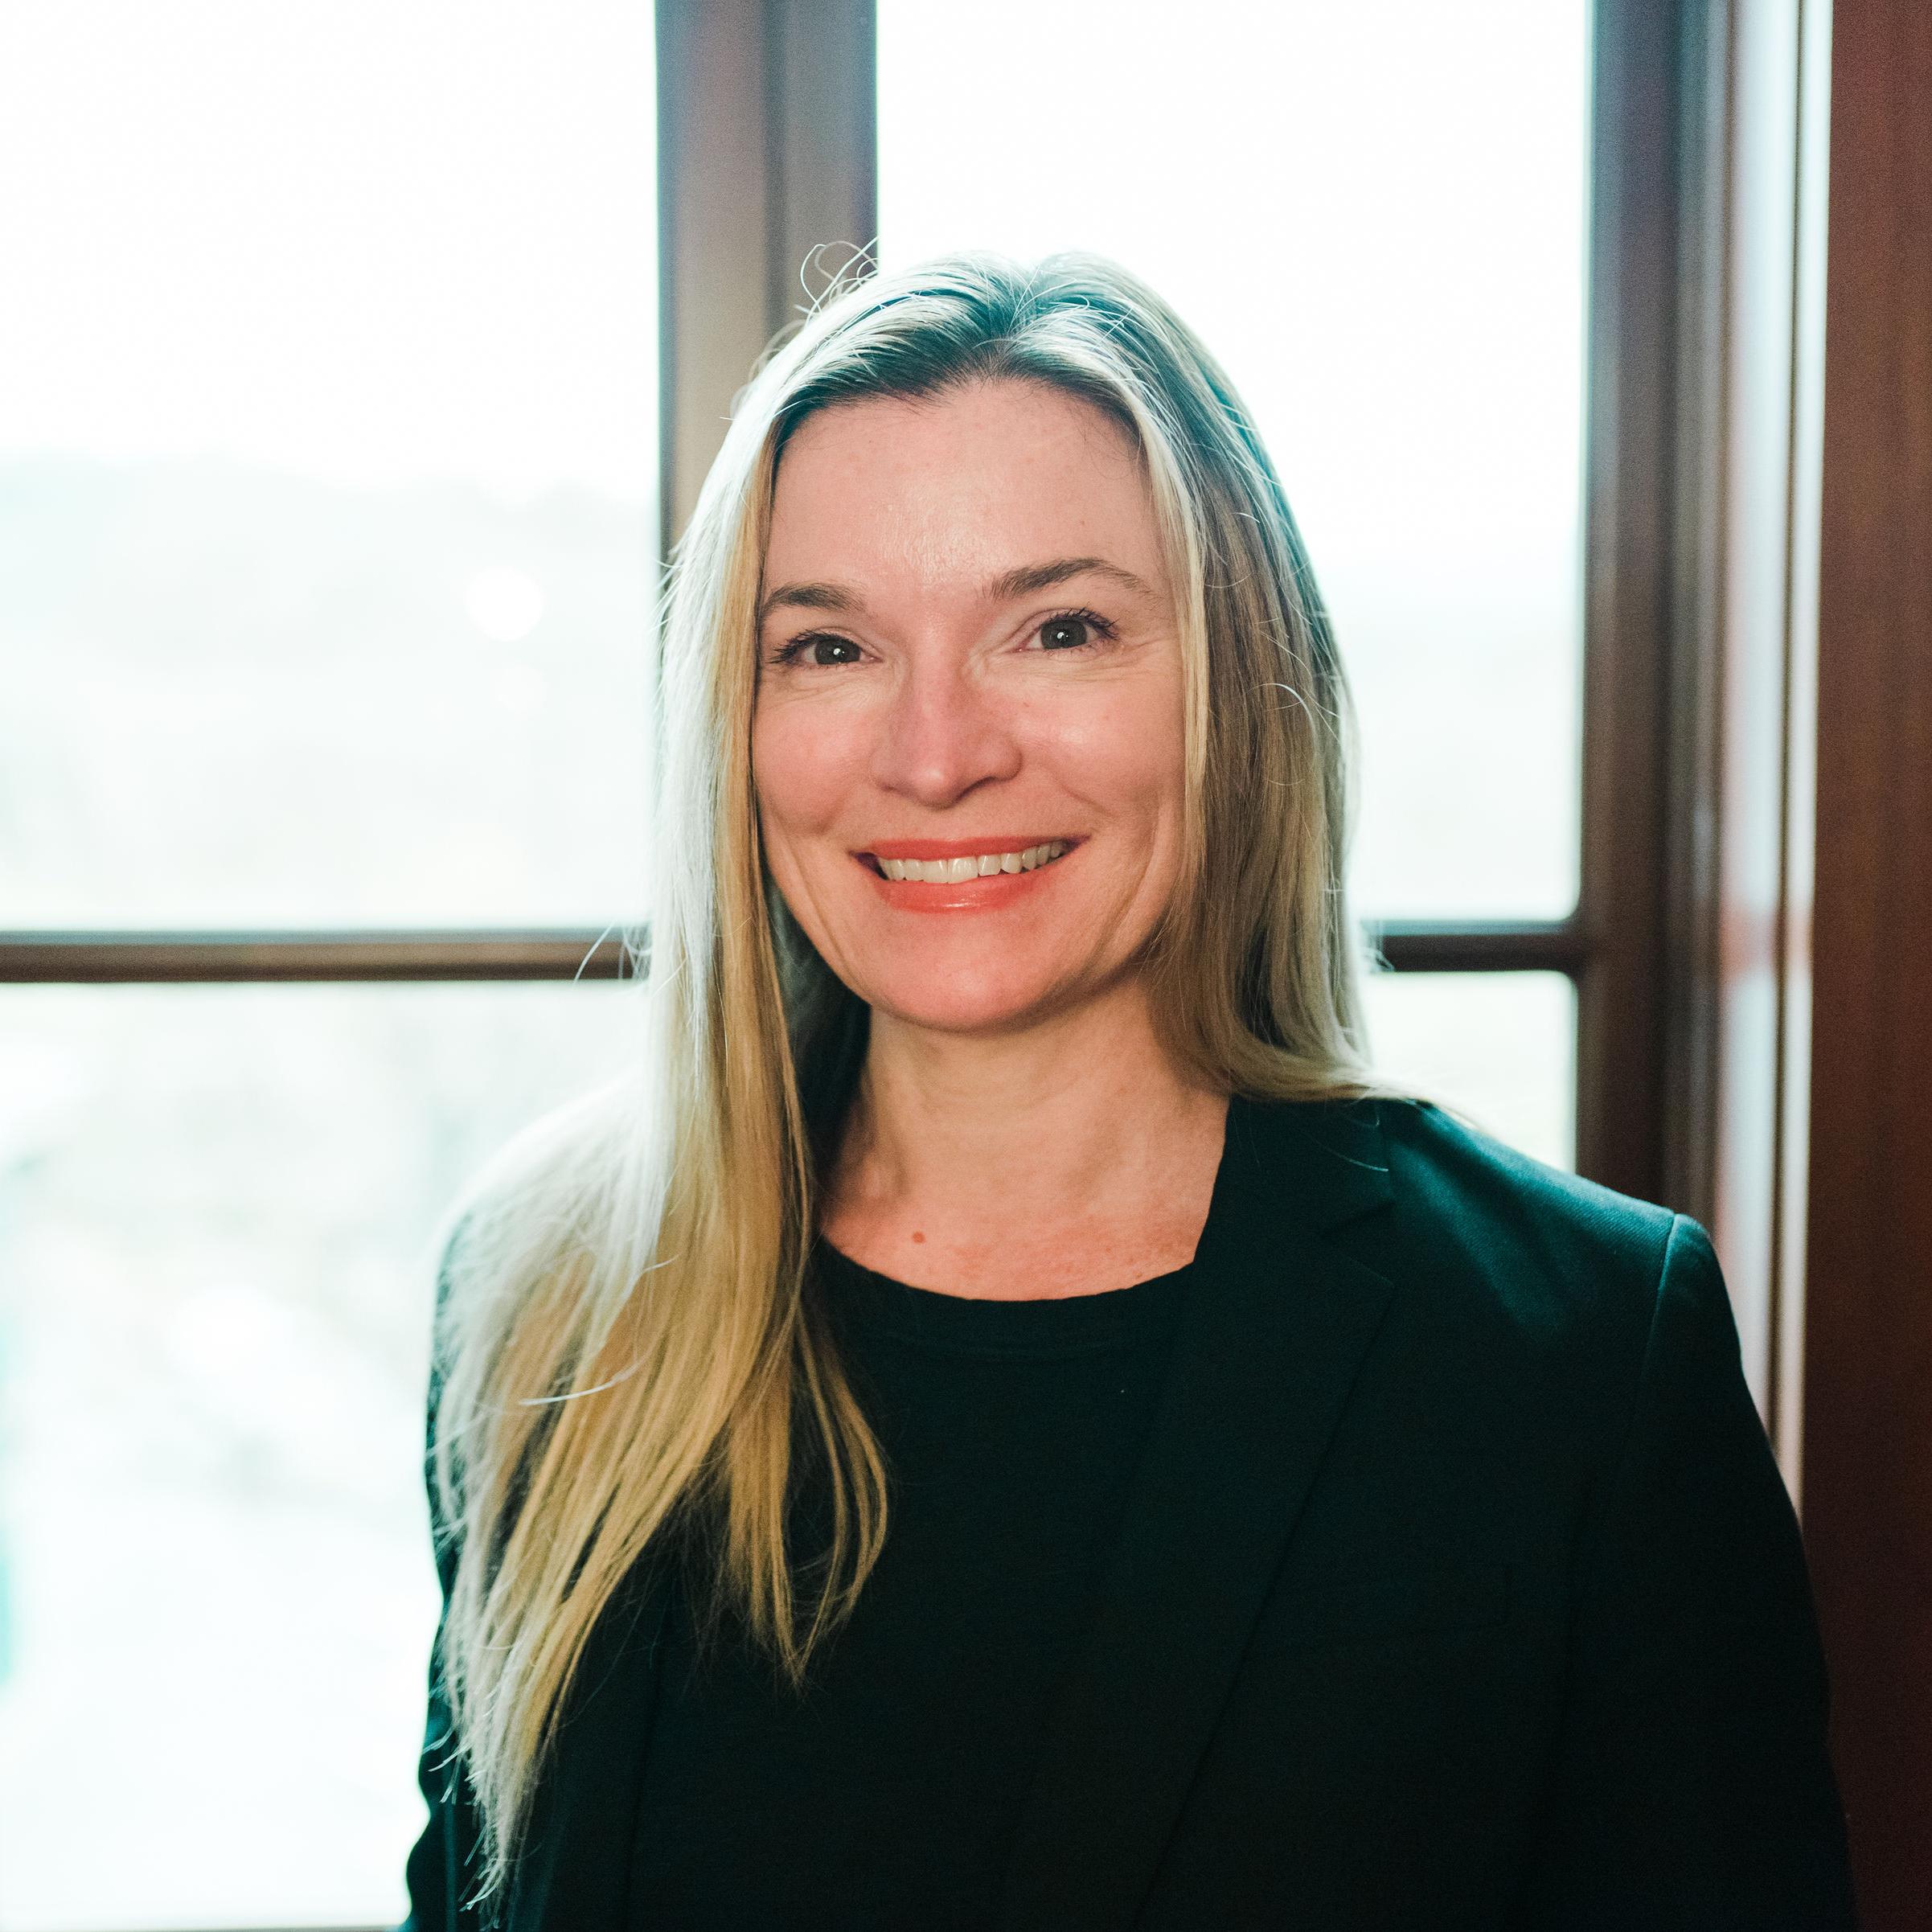 Allison Wetsel - Executive Vice President, Sales, Ranch Rider Spirits Co.